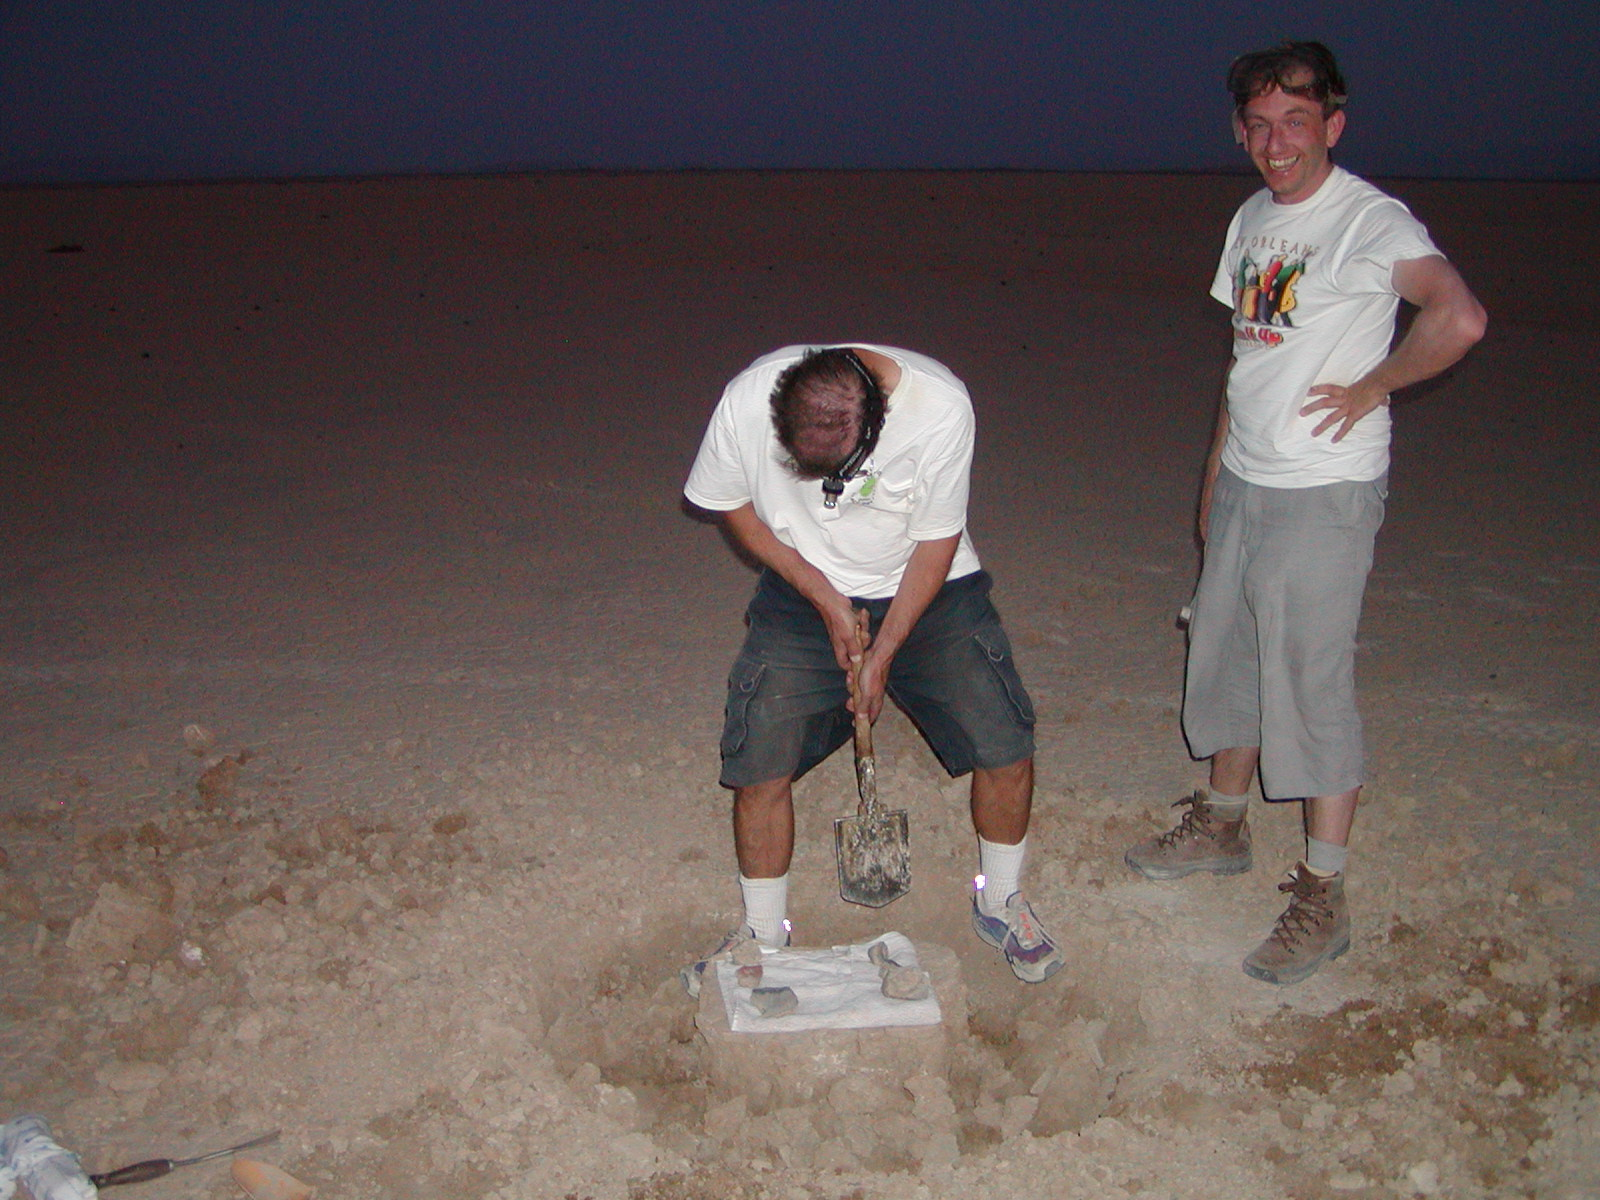 Heinz Huber (then at UCLA) and Peter excavating the meteorite.